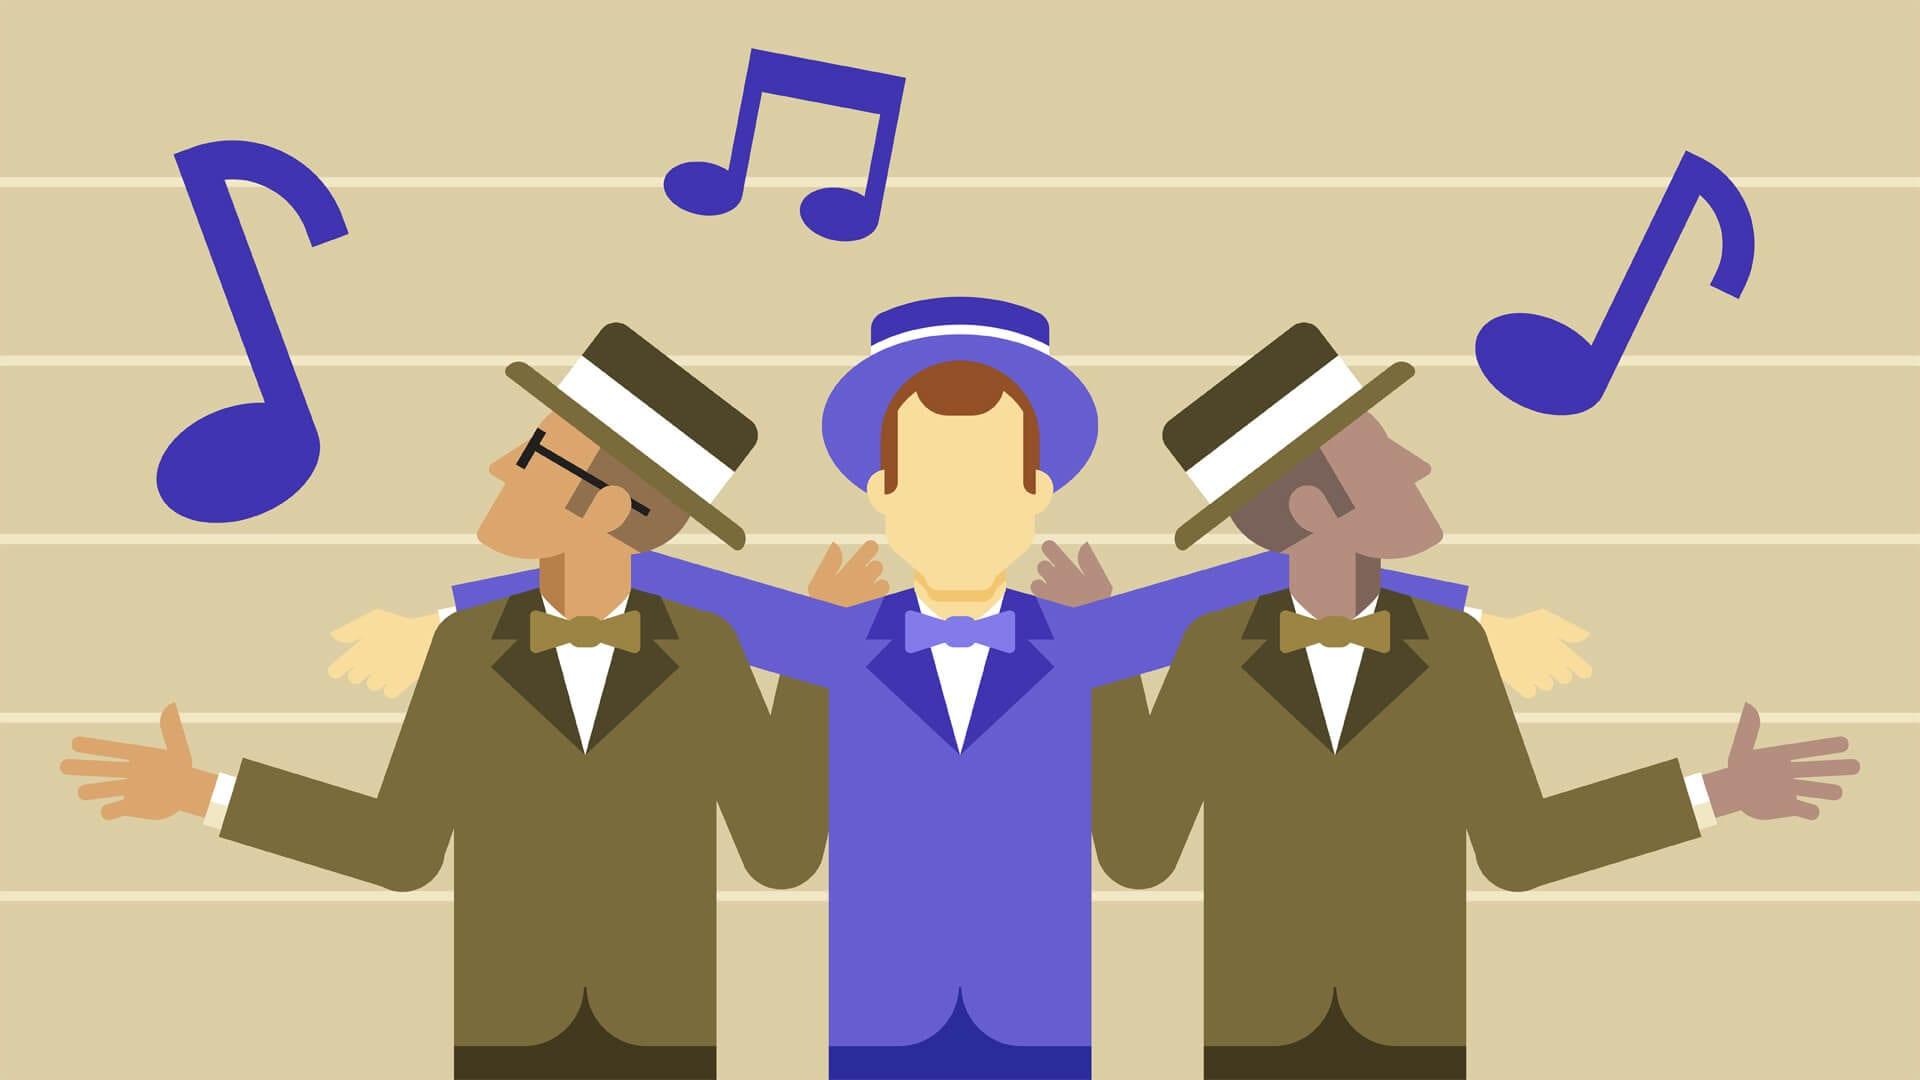 Harmony in Music